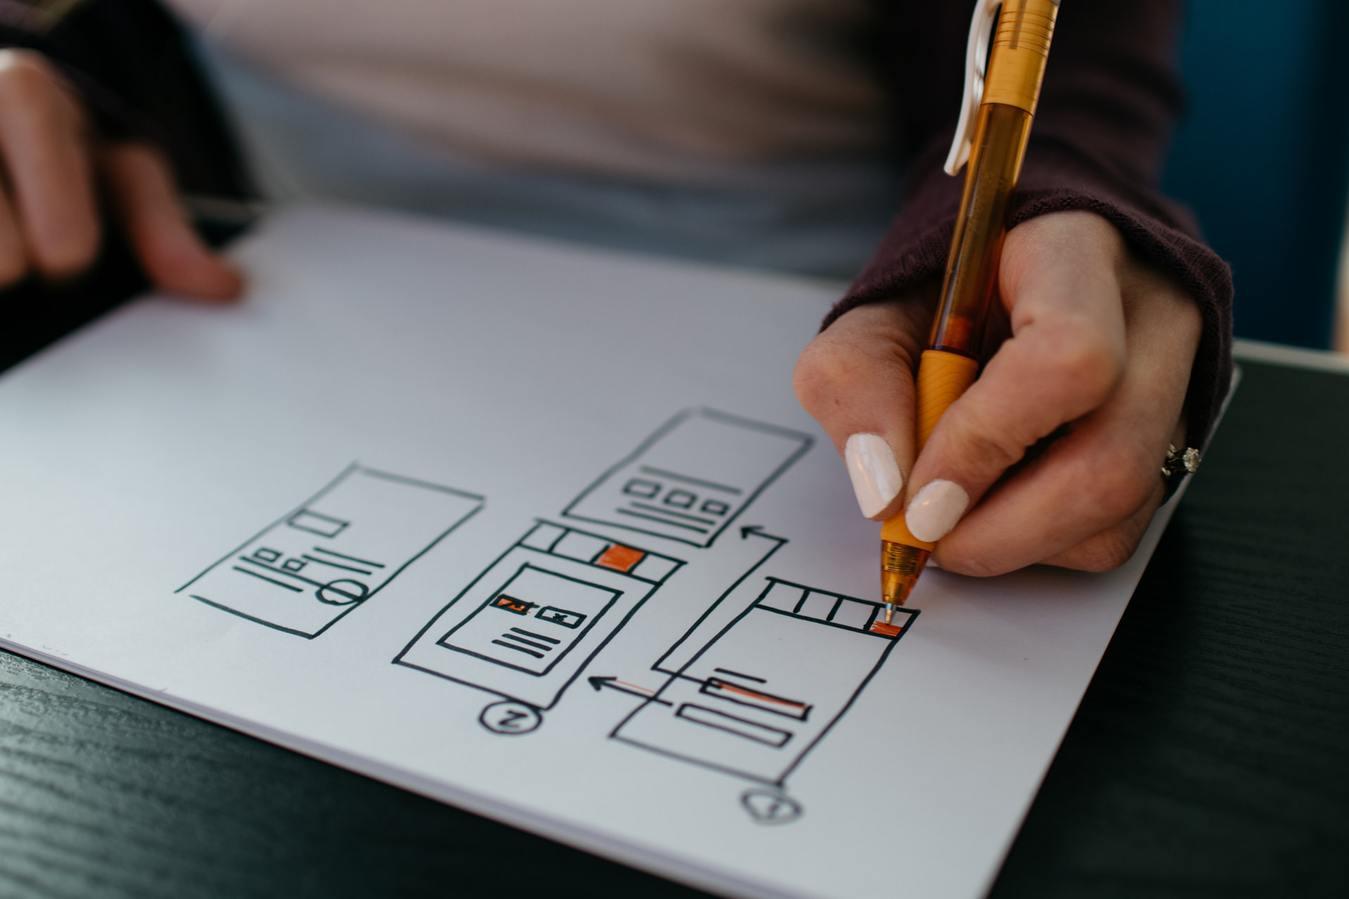 Tangan menggambar user experience